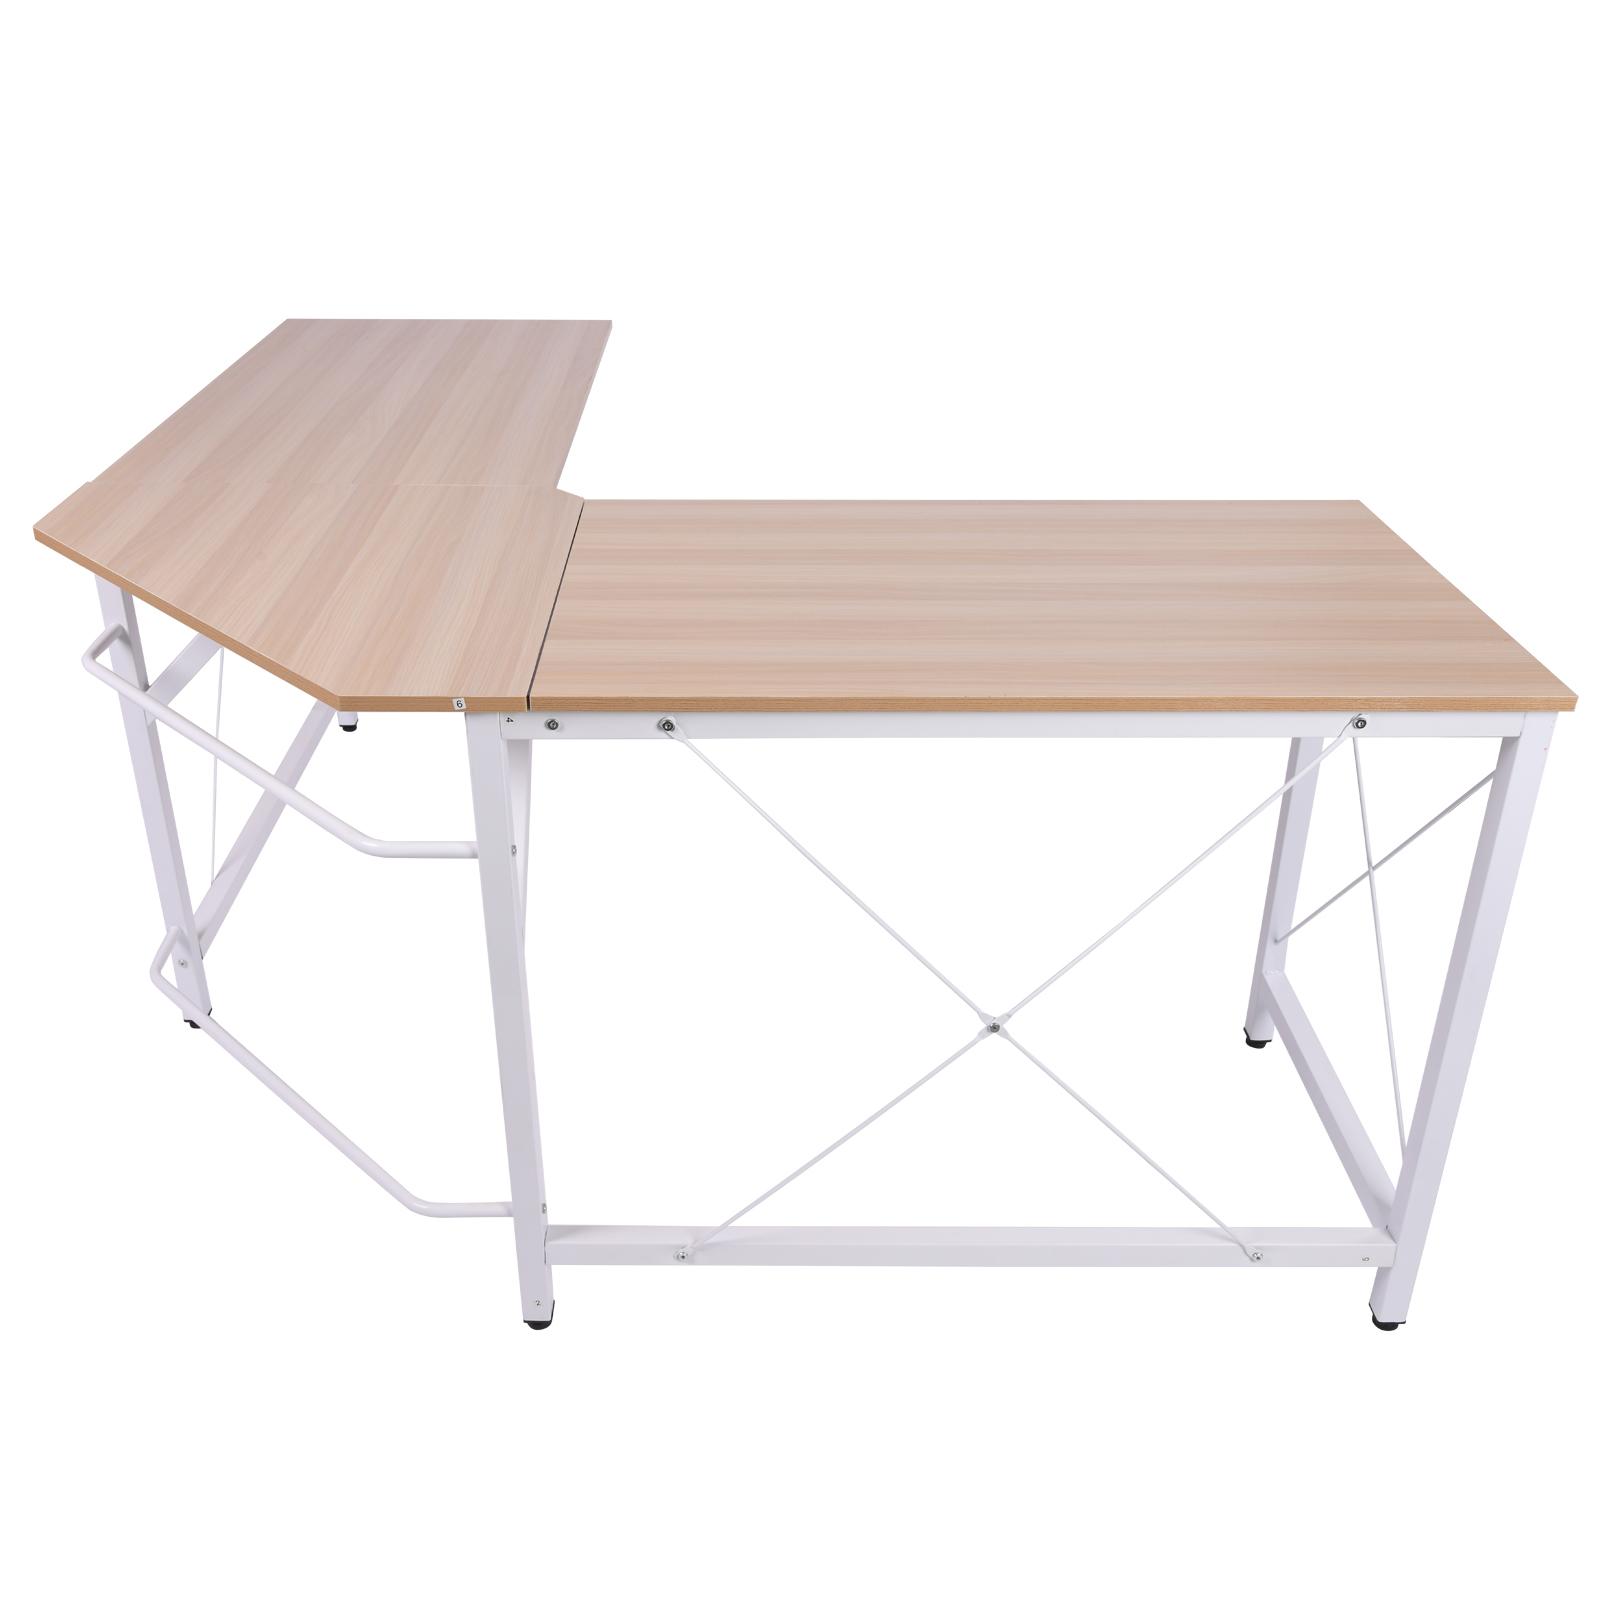 L-Shaped-Computer-Desk-Office-Wood-Corner-PC-Workstation-Large-Gaming-Desk-Table miniature 18